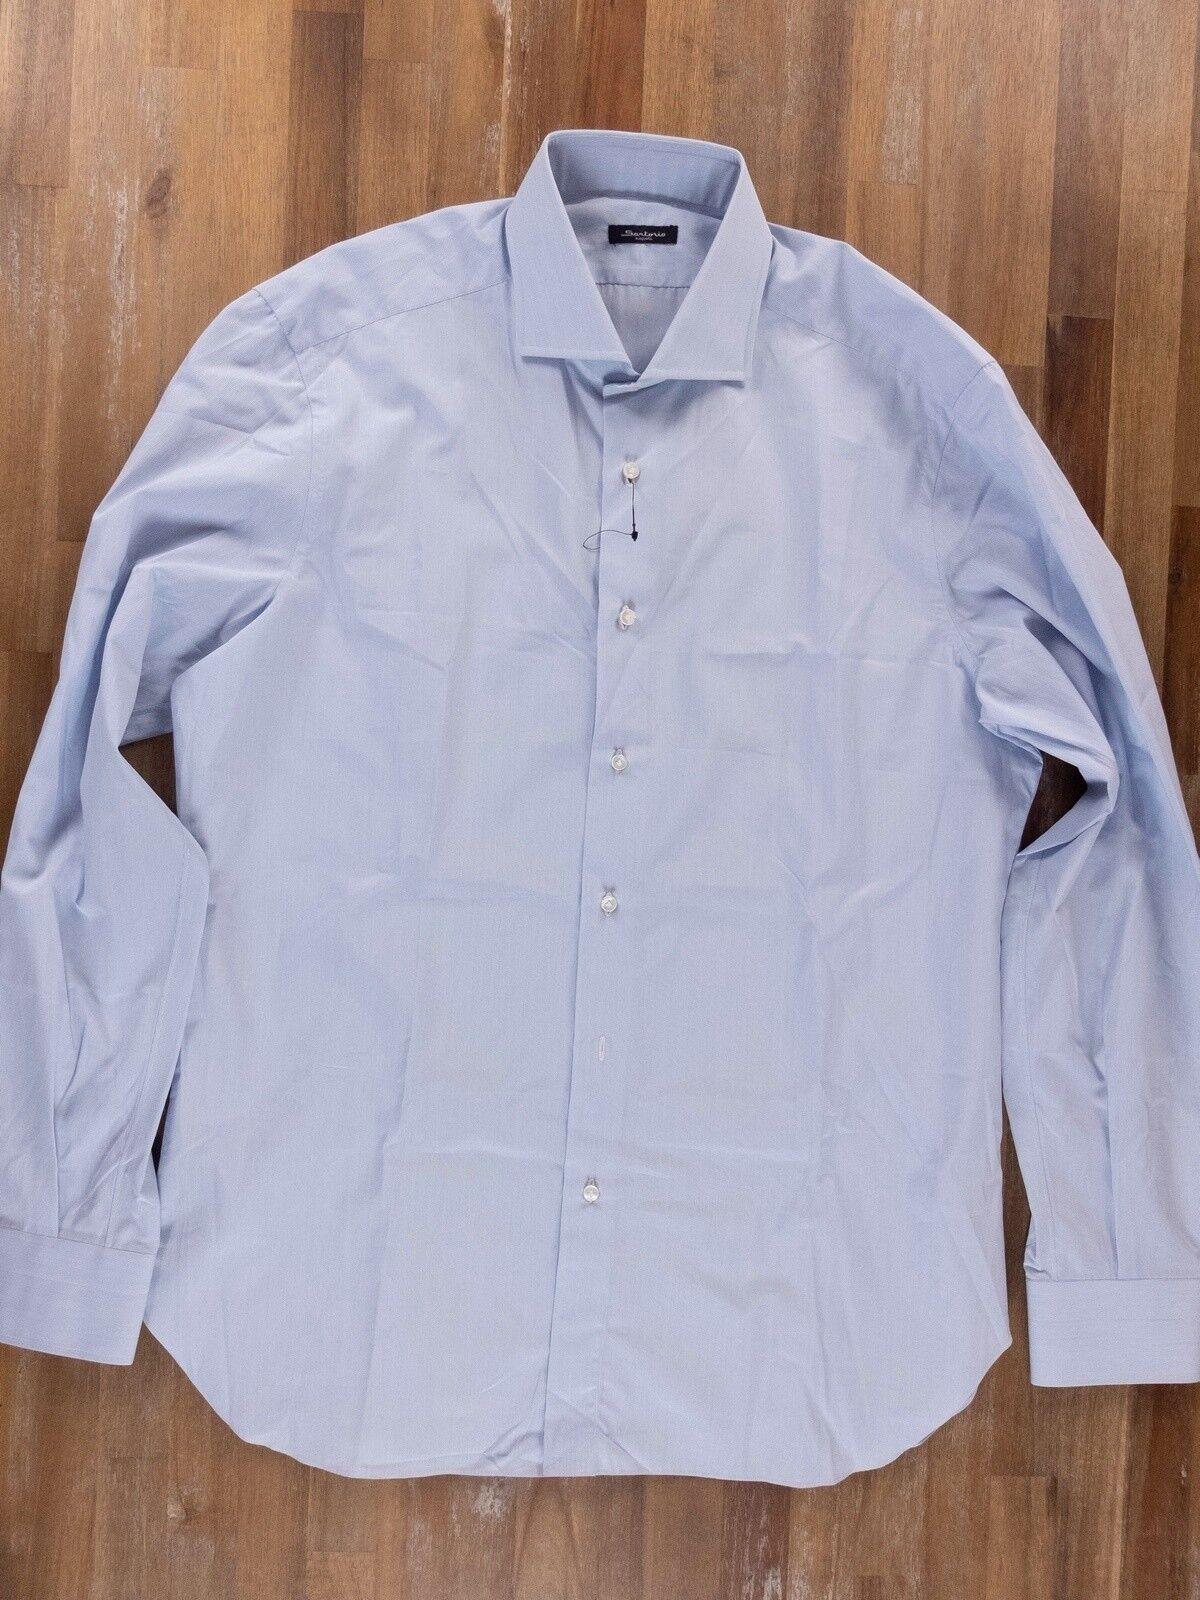 SARTORIO KITON striped cotton dress shirt authentic - Größe 43 / 17 - NWOT